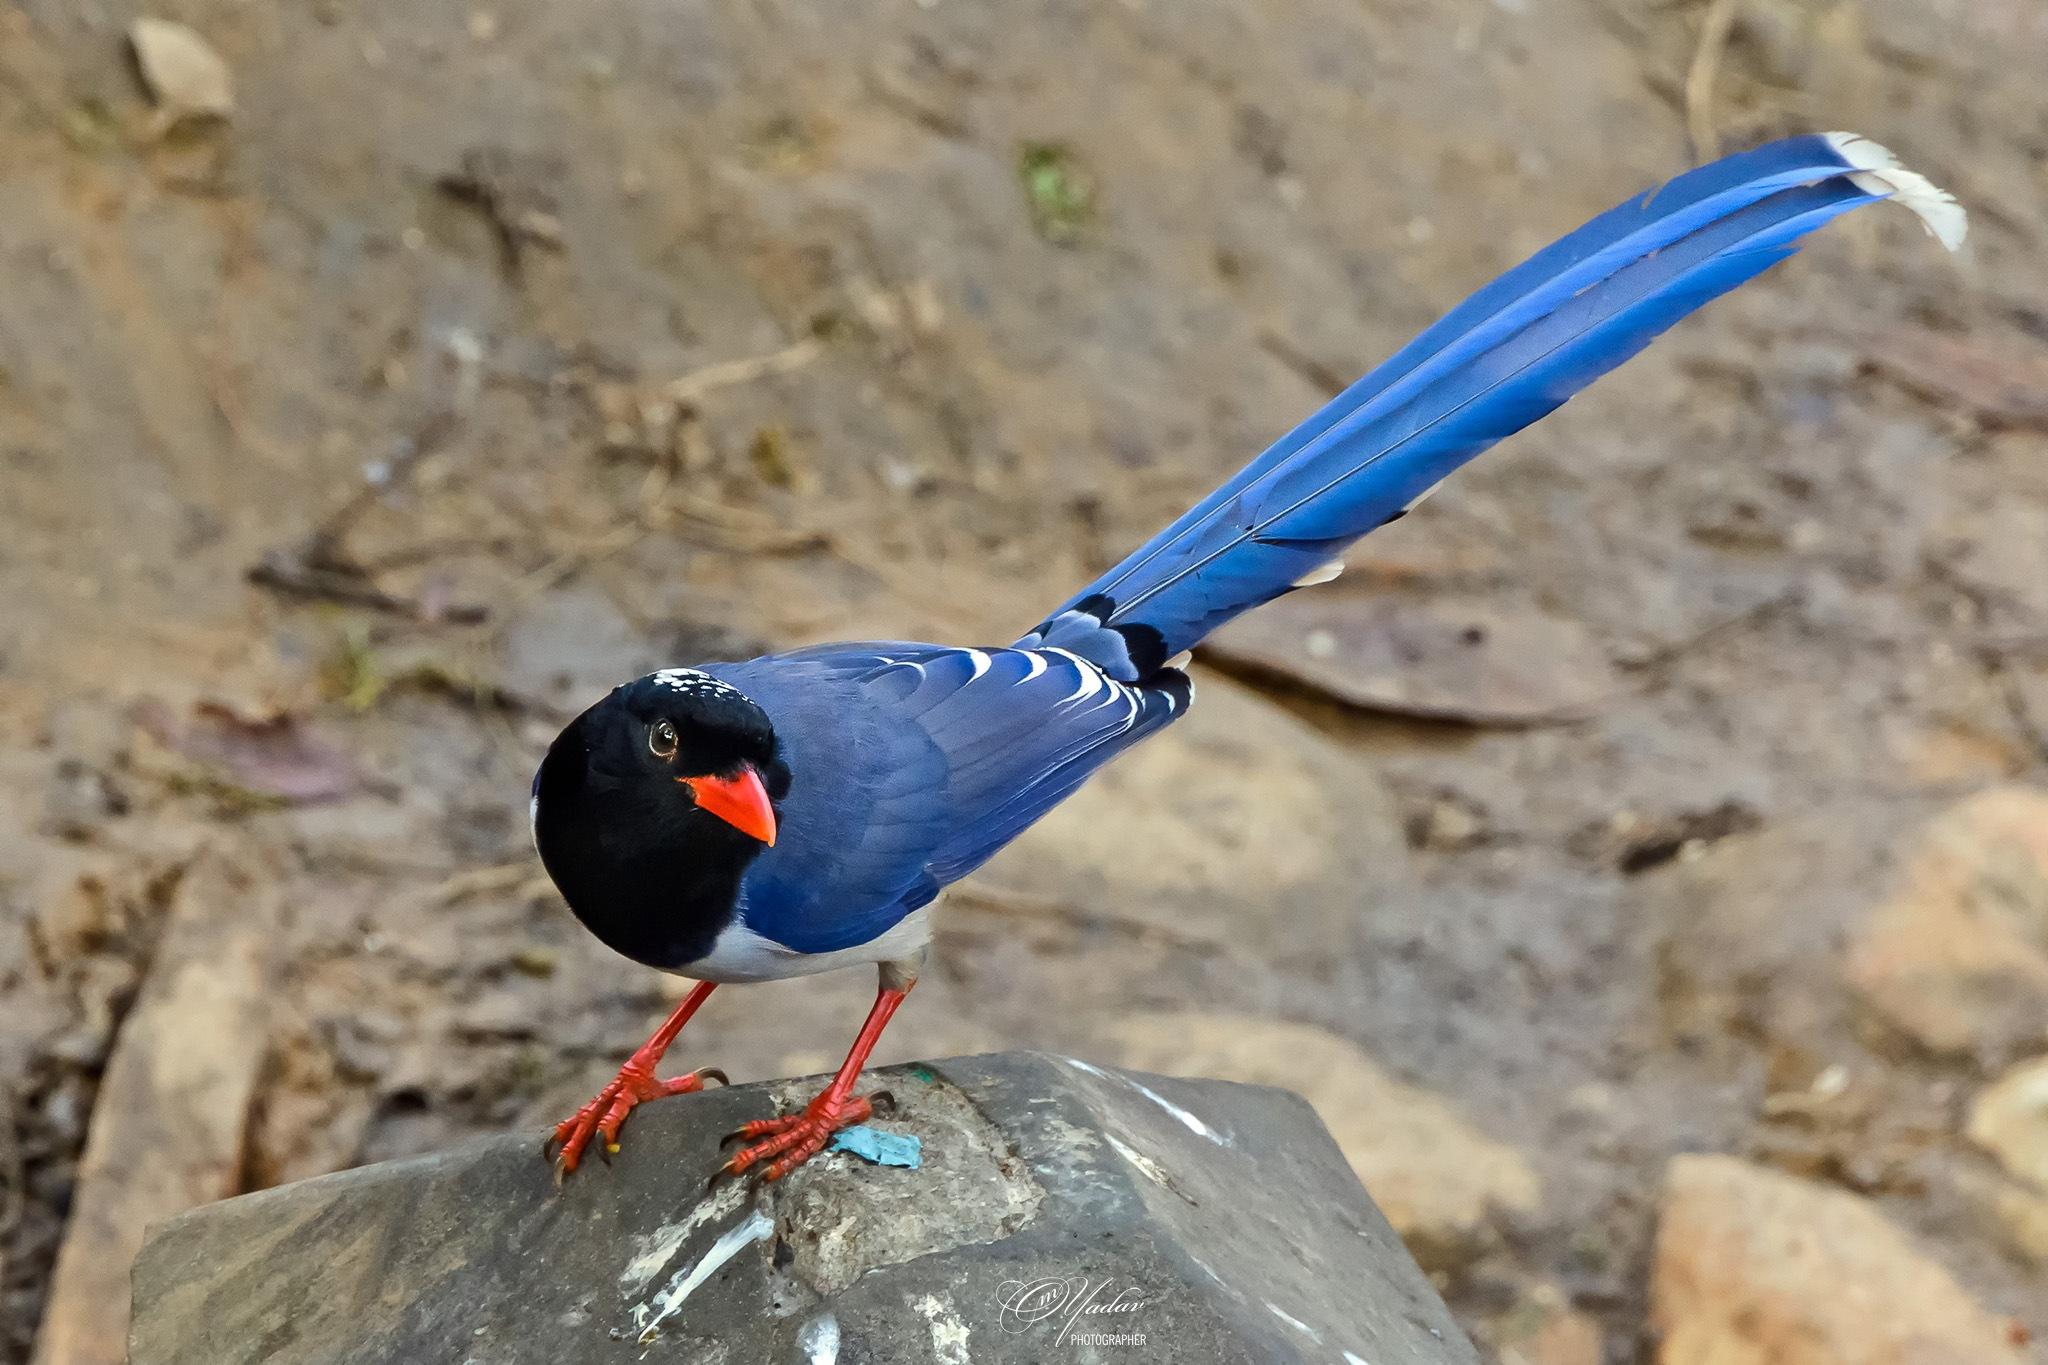 Red-billed Blue Magpie by Om Yadav